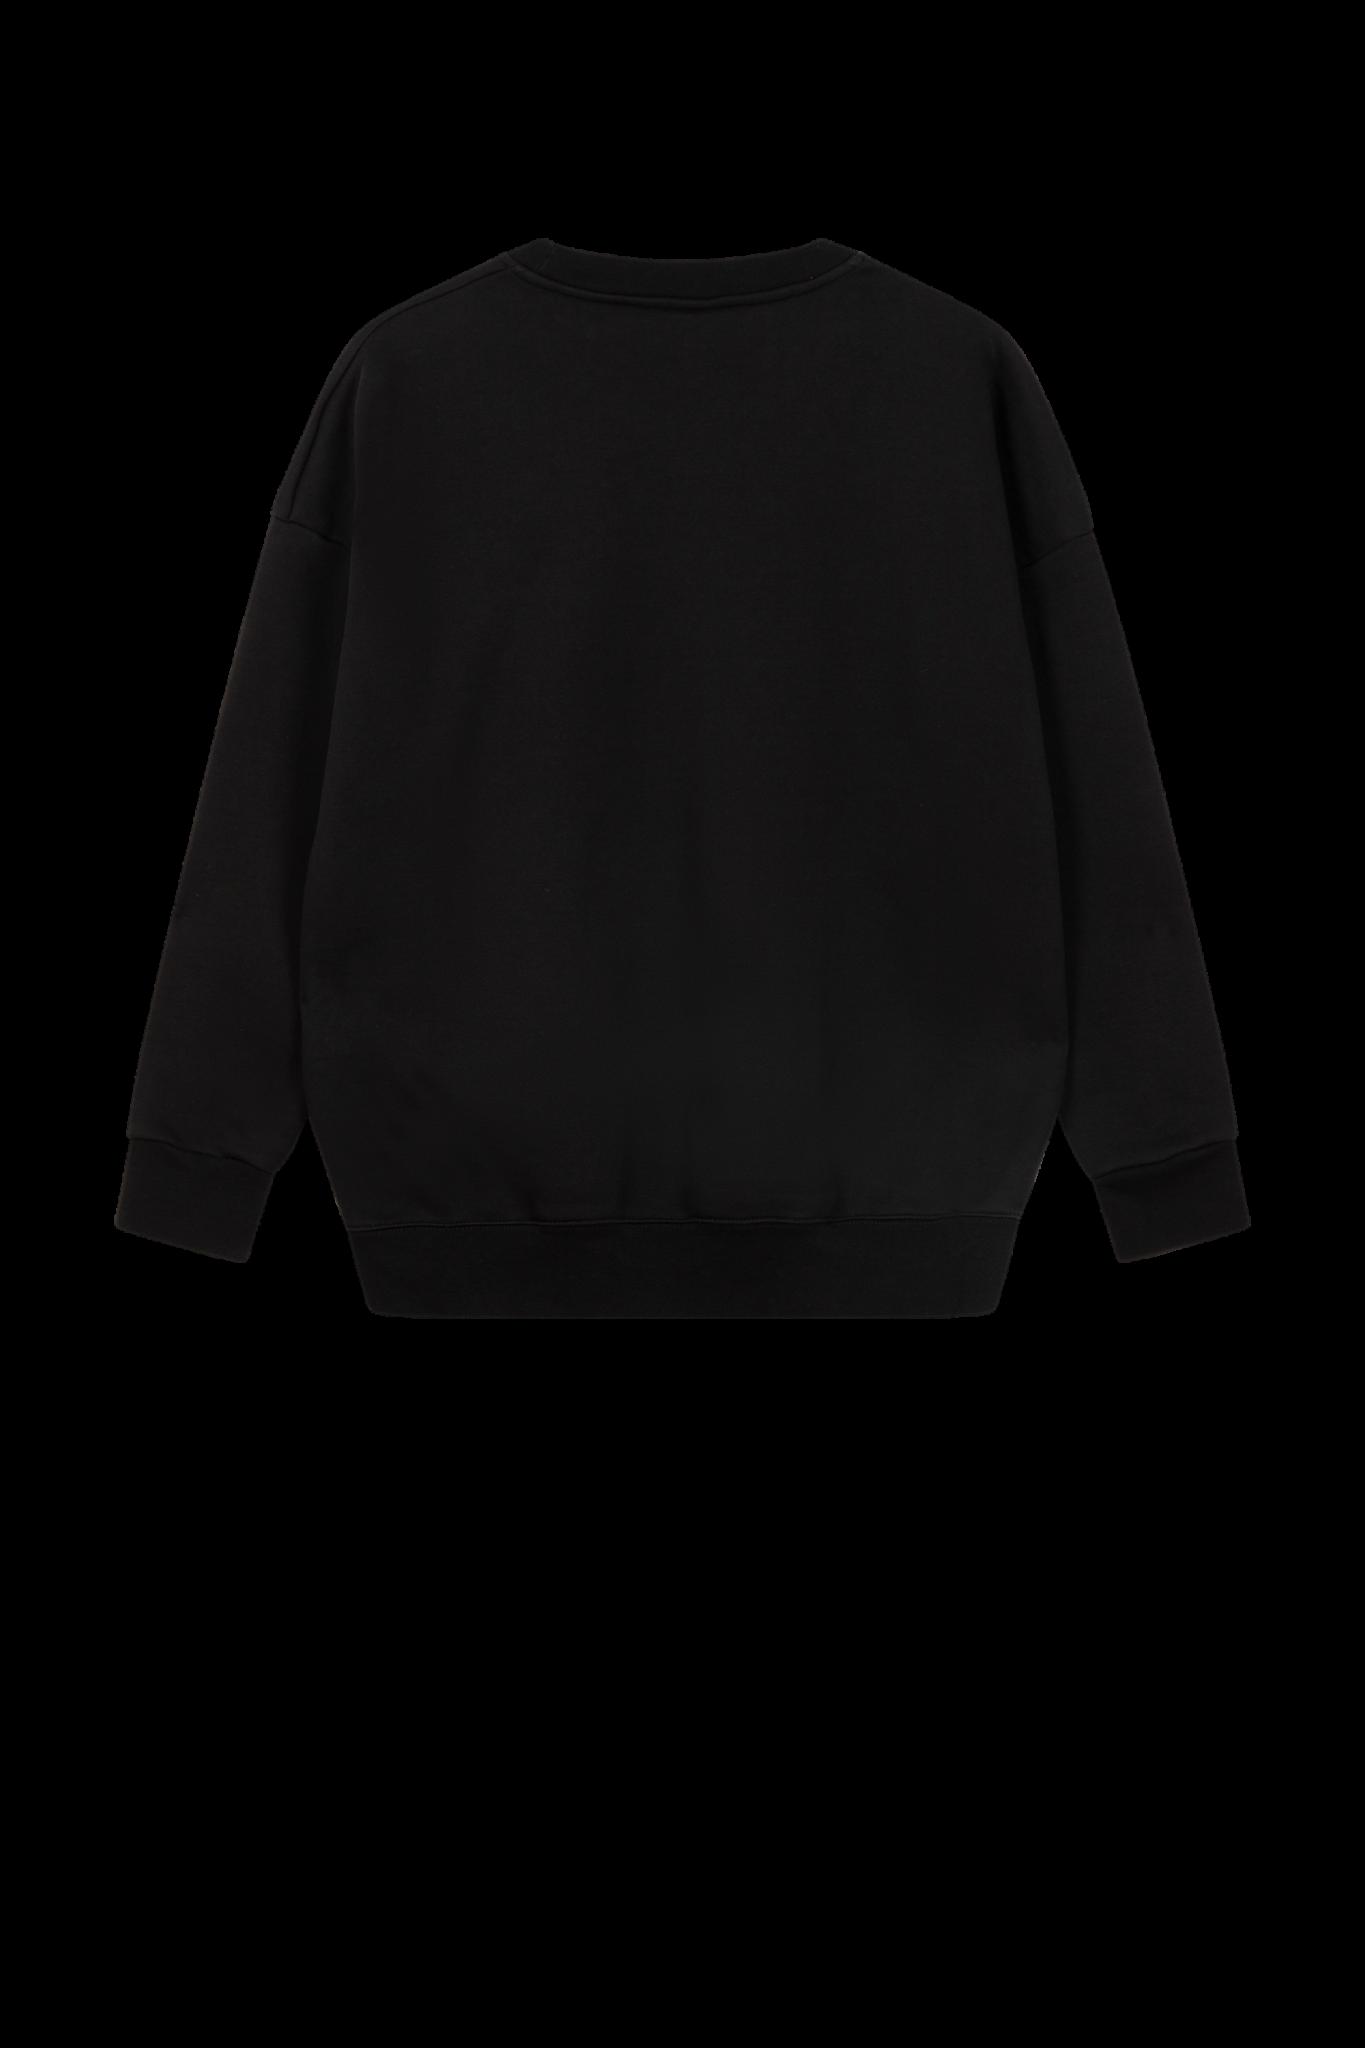 Warm Ups Sweater - Black-2